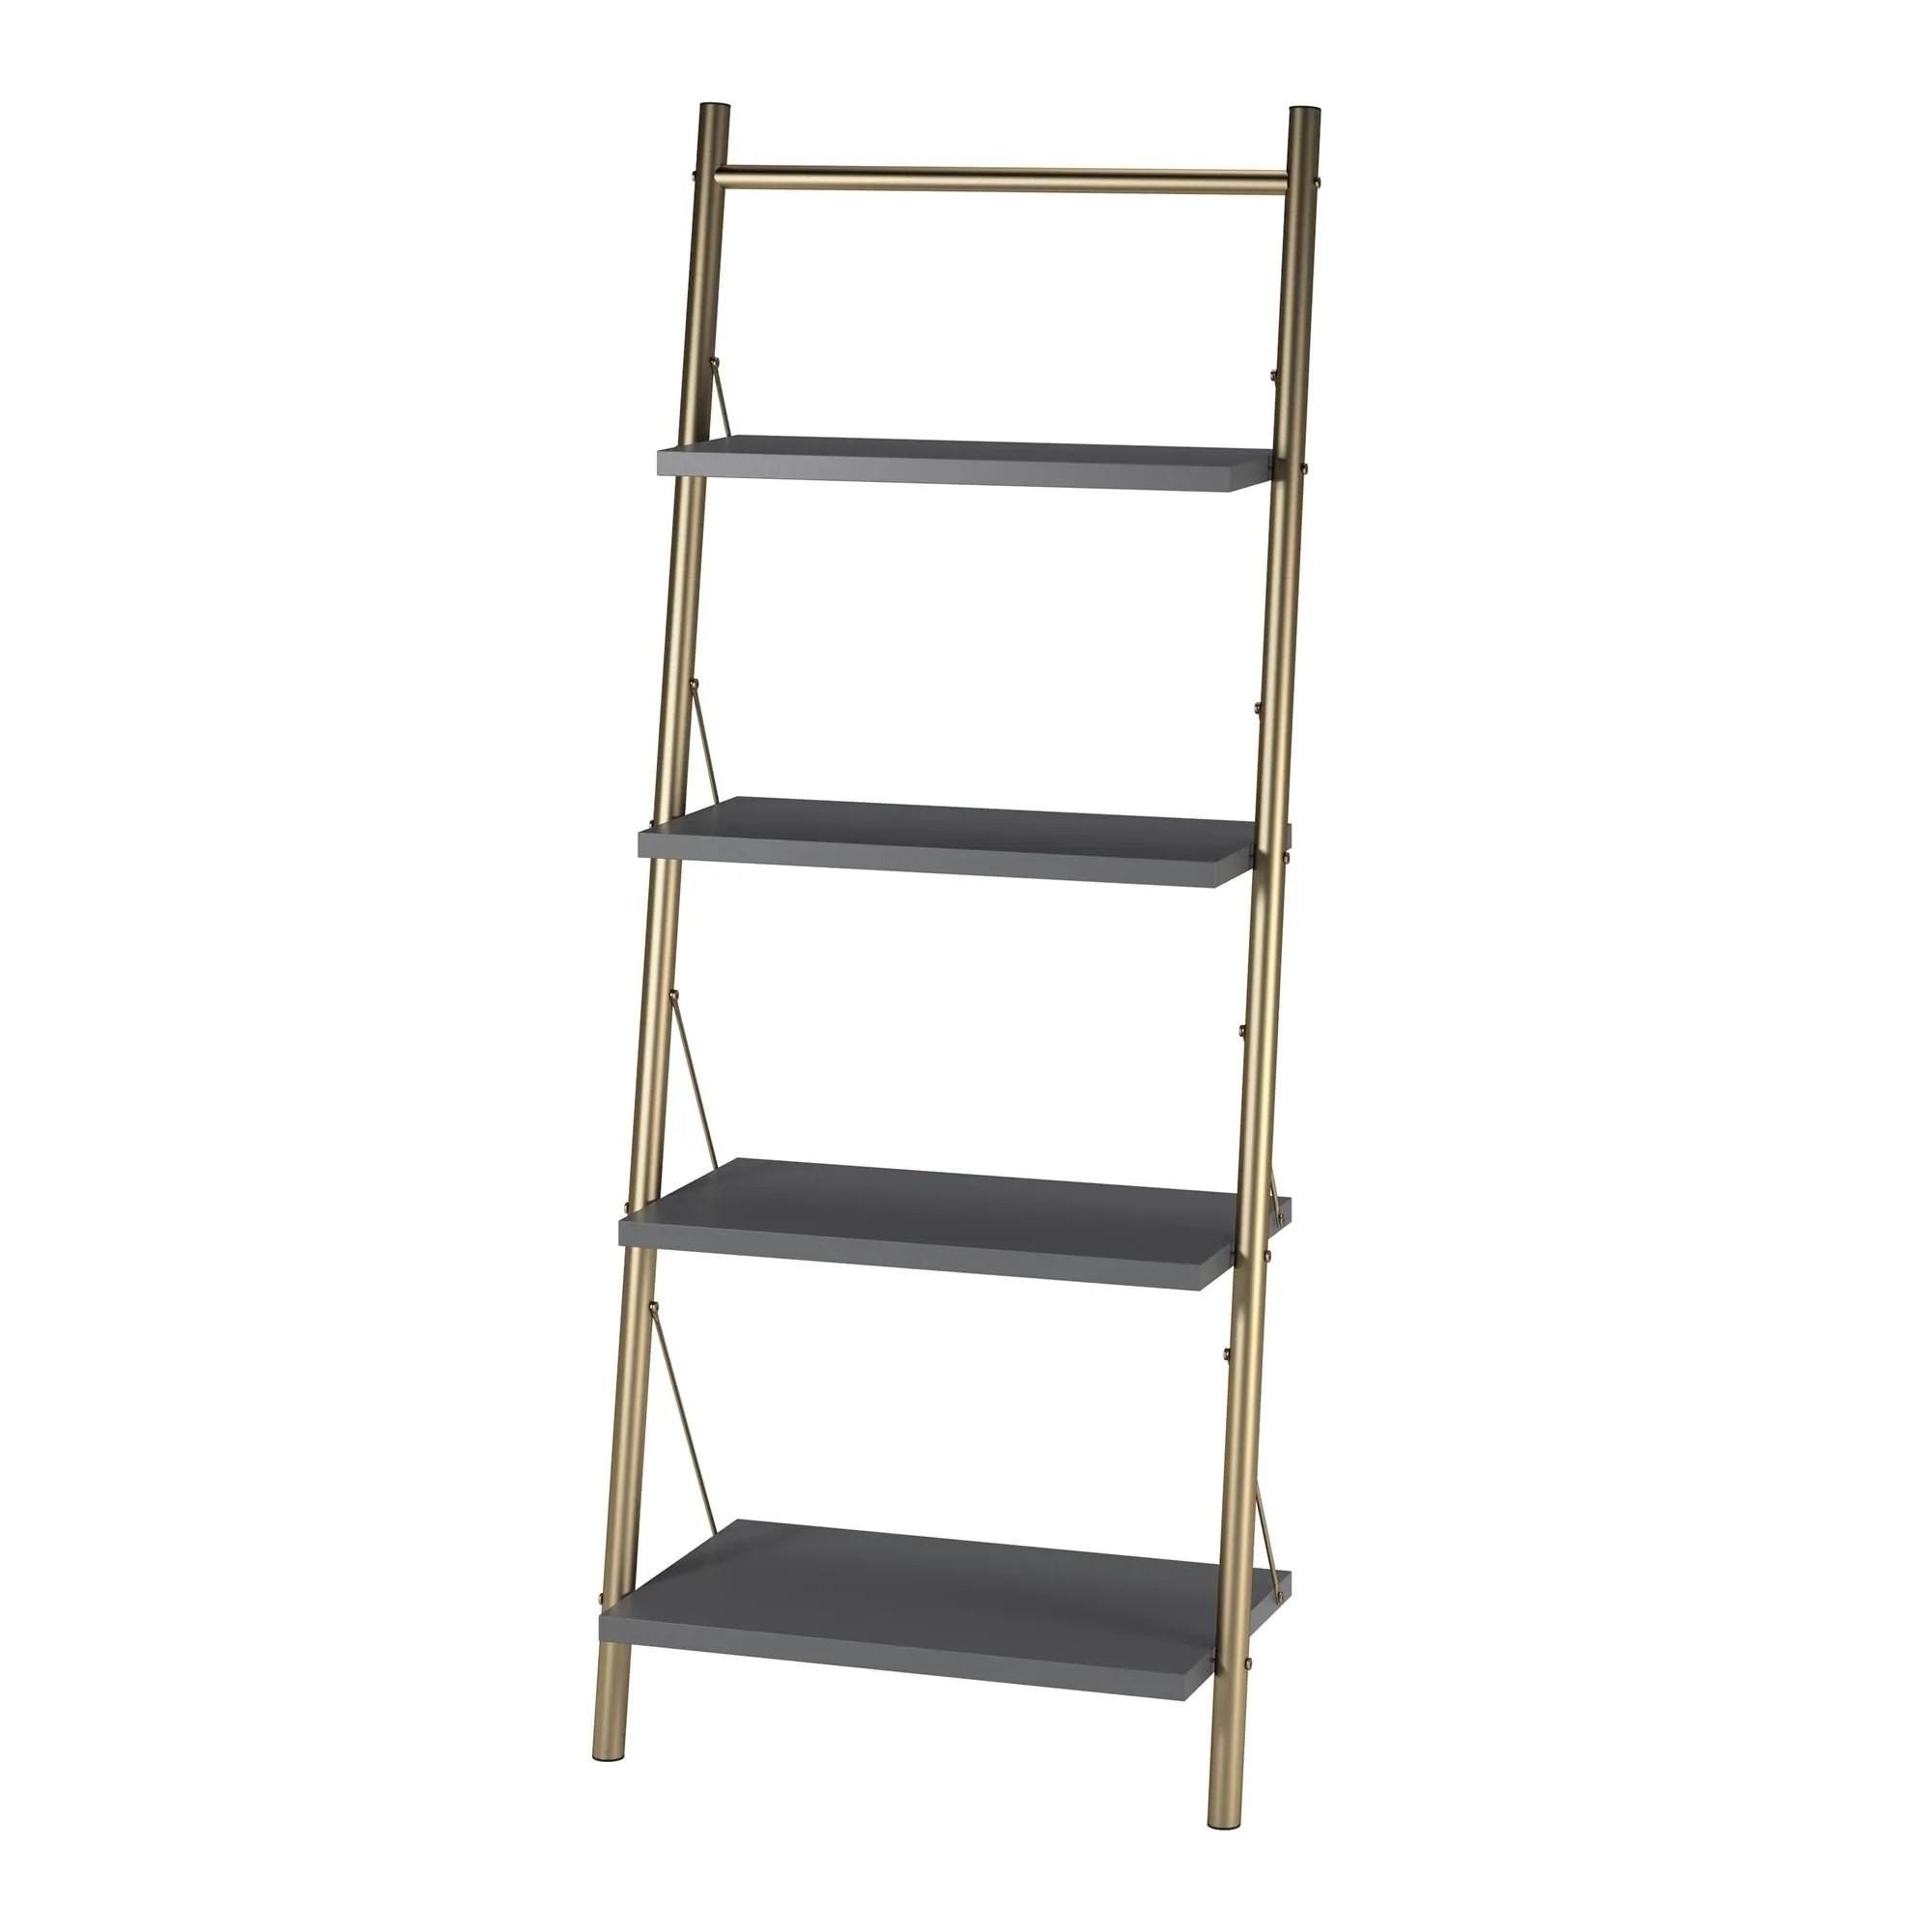 Cosmoliving By Cosmopolitan Nova 4 Shelf Ladder Bookcase